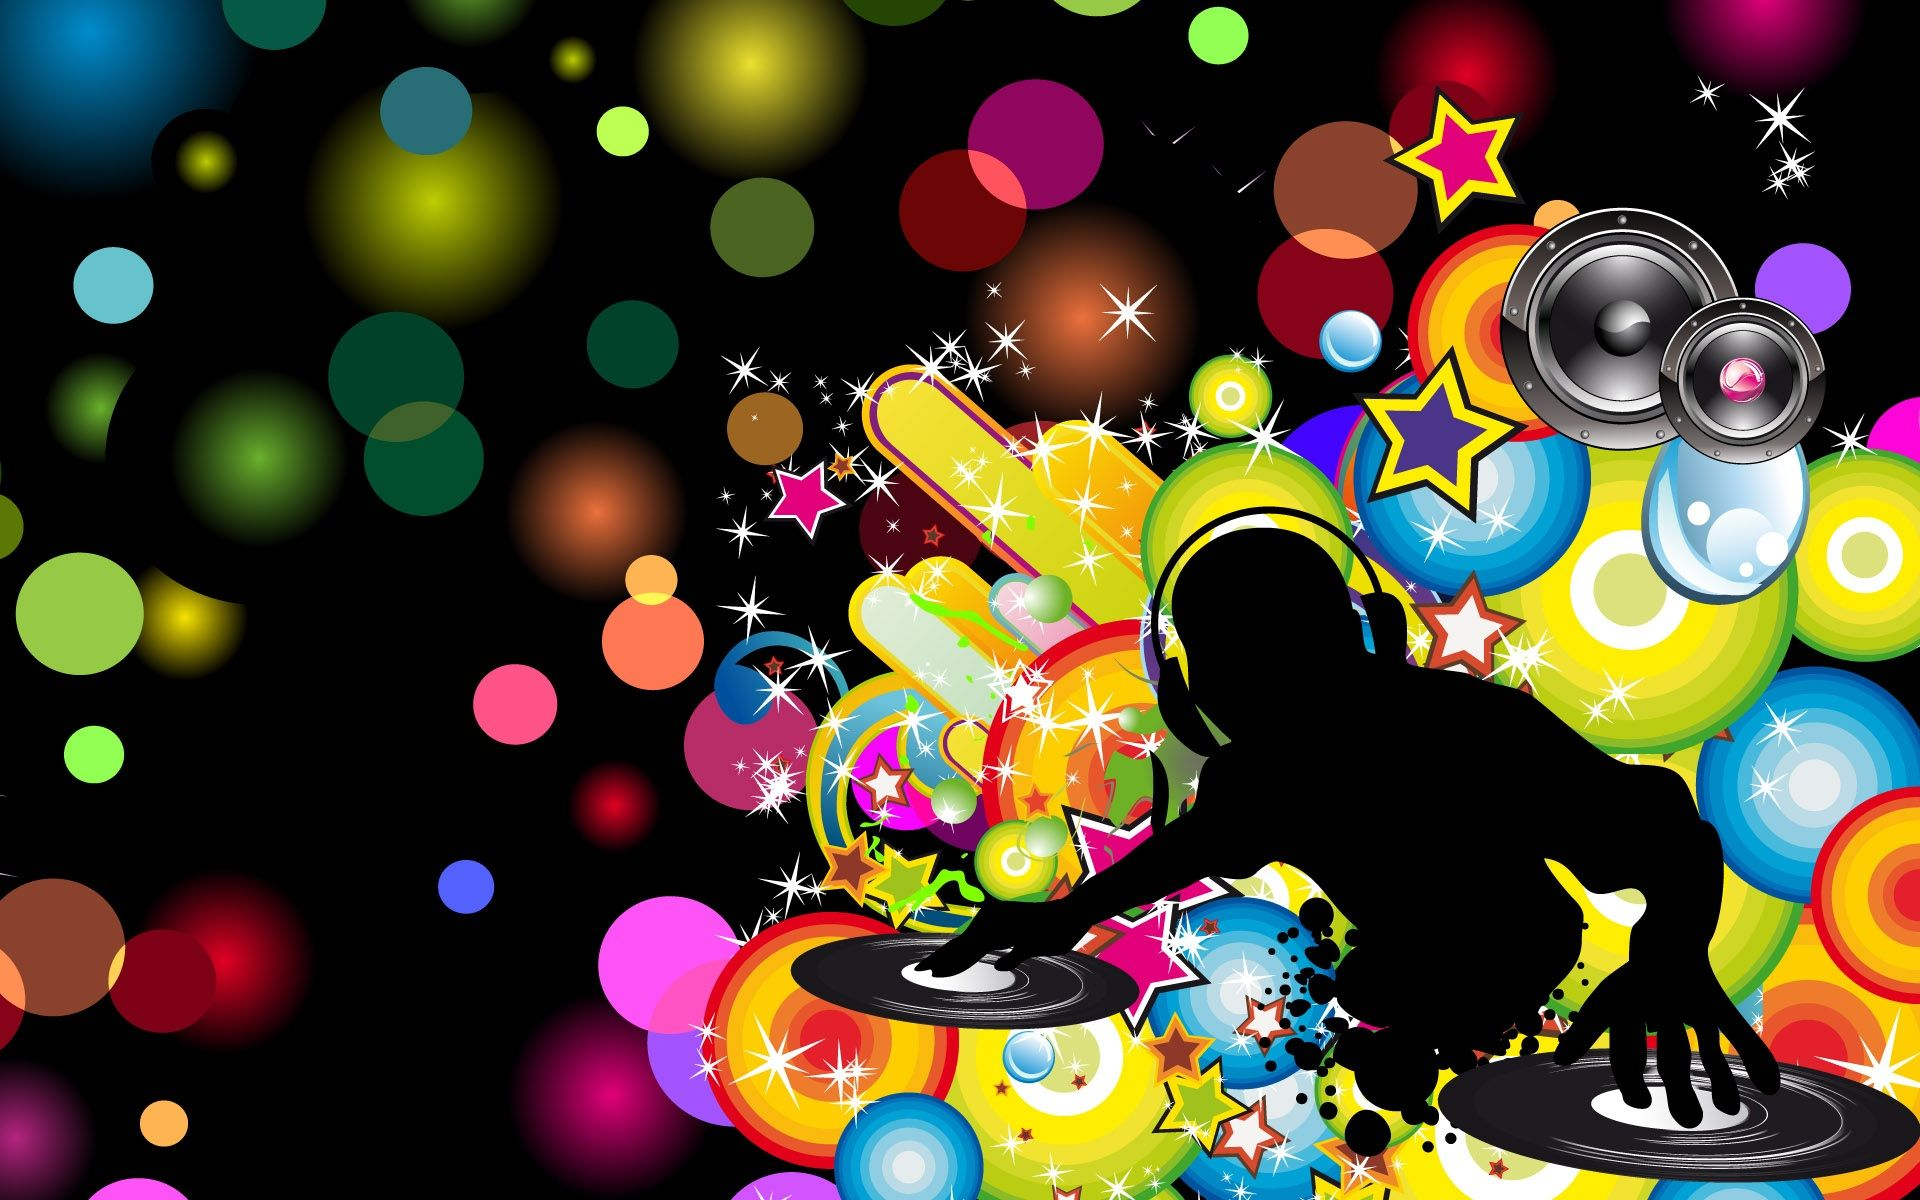 Most Inspiring Wallpaper Music Party - 899fb05f520492894aa43a1a950cfa76  Trends_548958.jpg